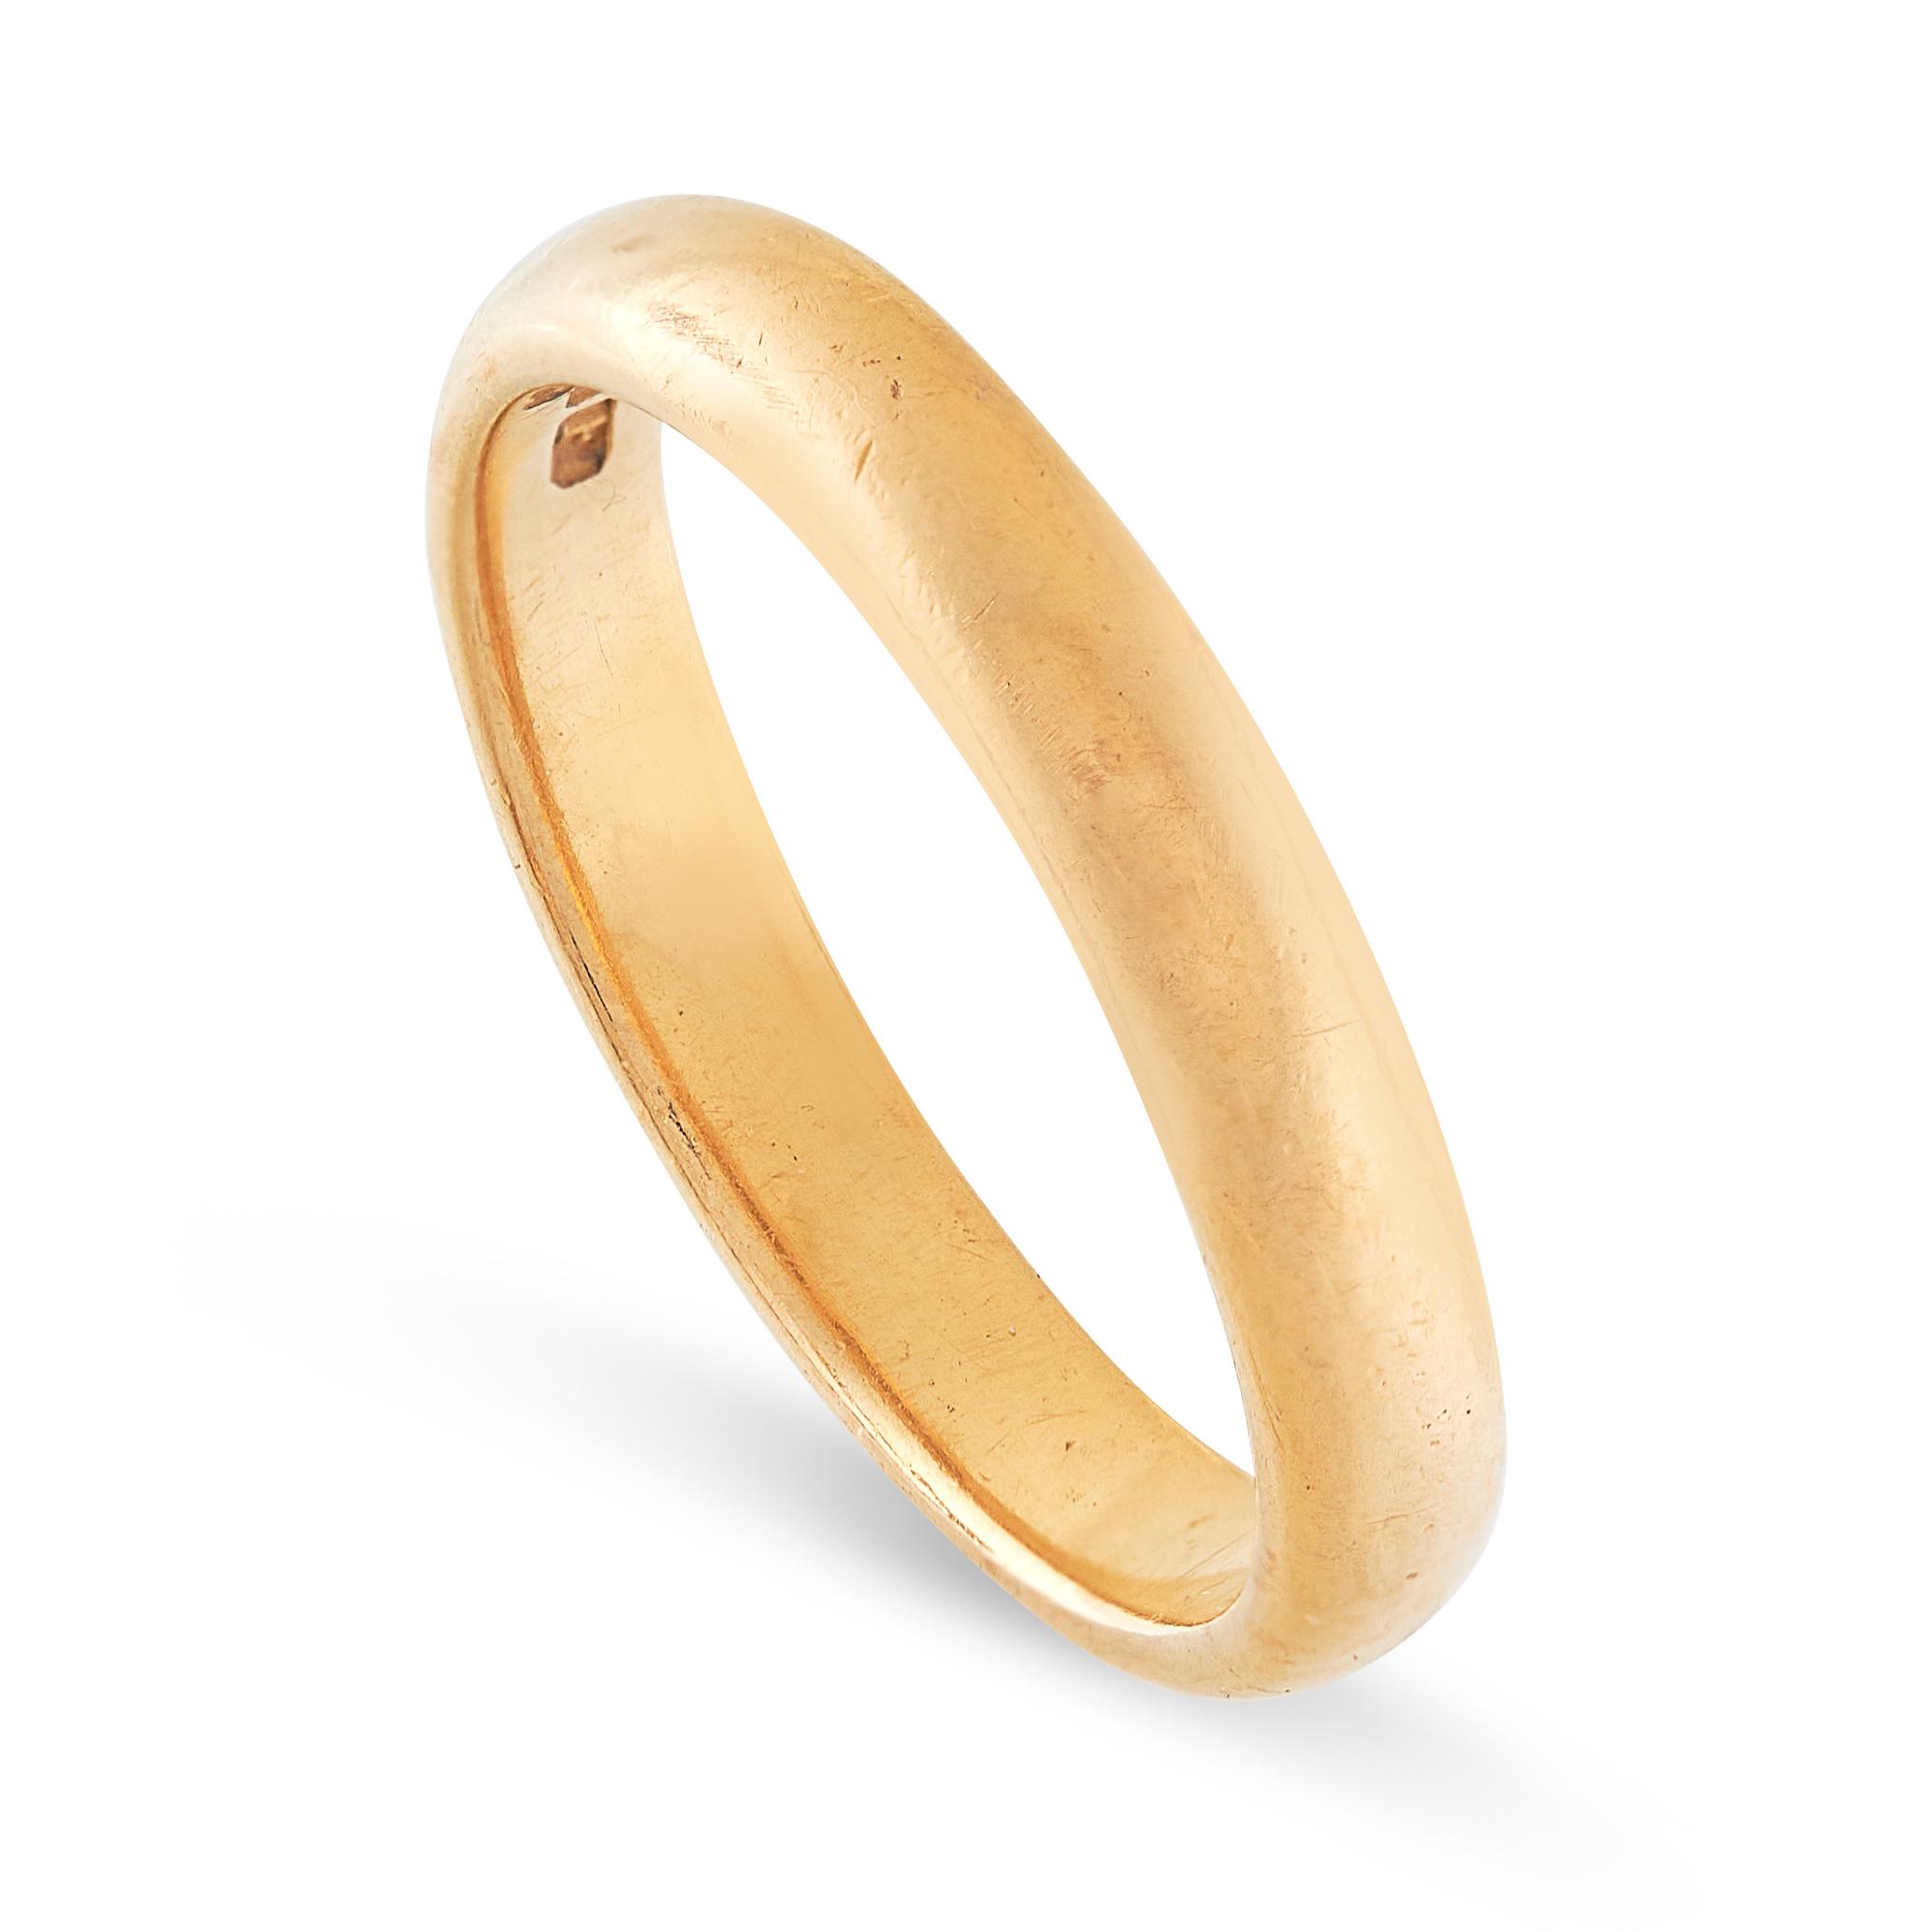 THREE WEDDING BAND RINGS in 22ct yellow gold, British hallmarks, sizes M / 6, R / 8.5, O / 7, - Image 5 of 6